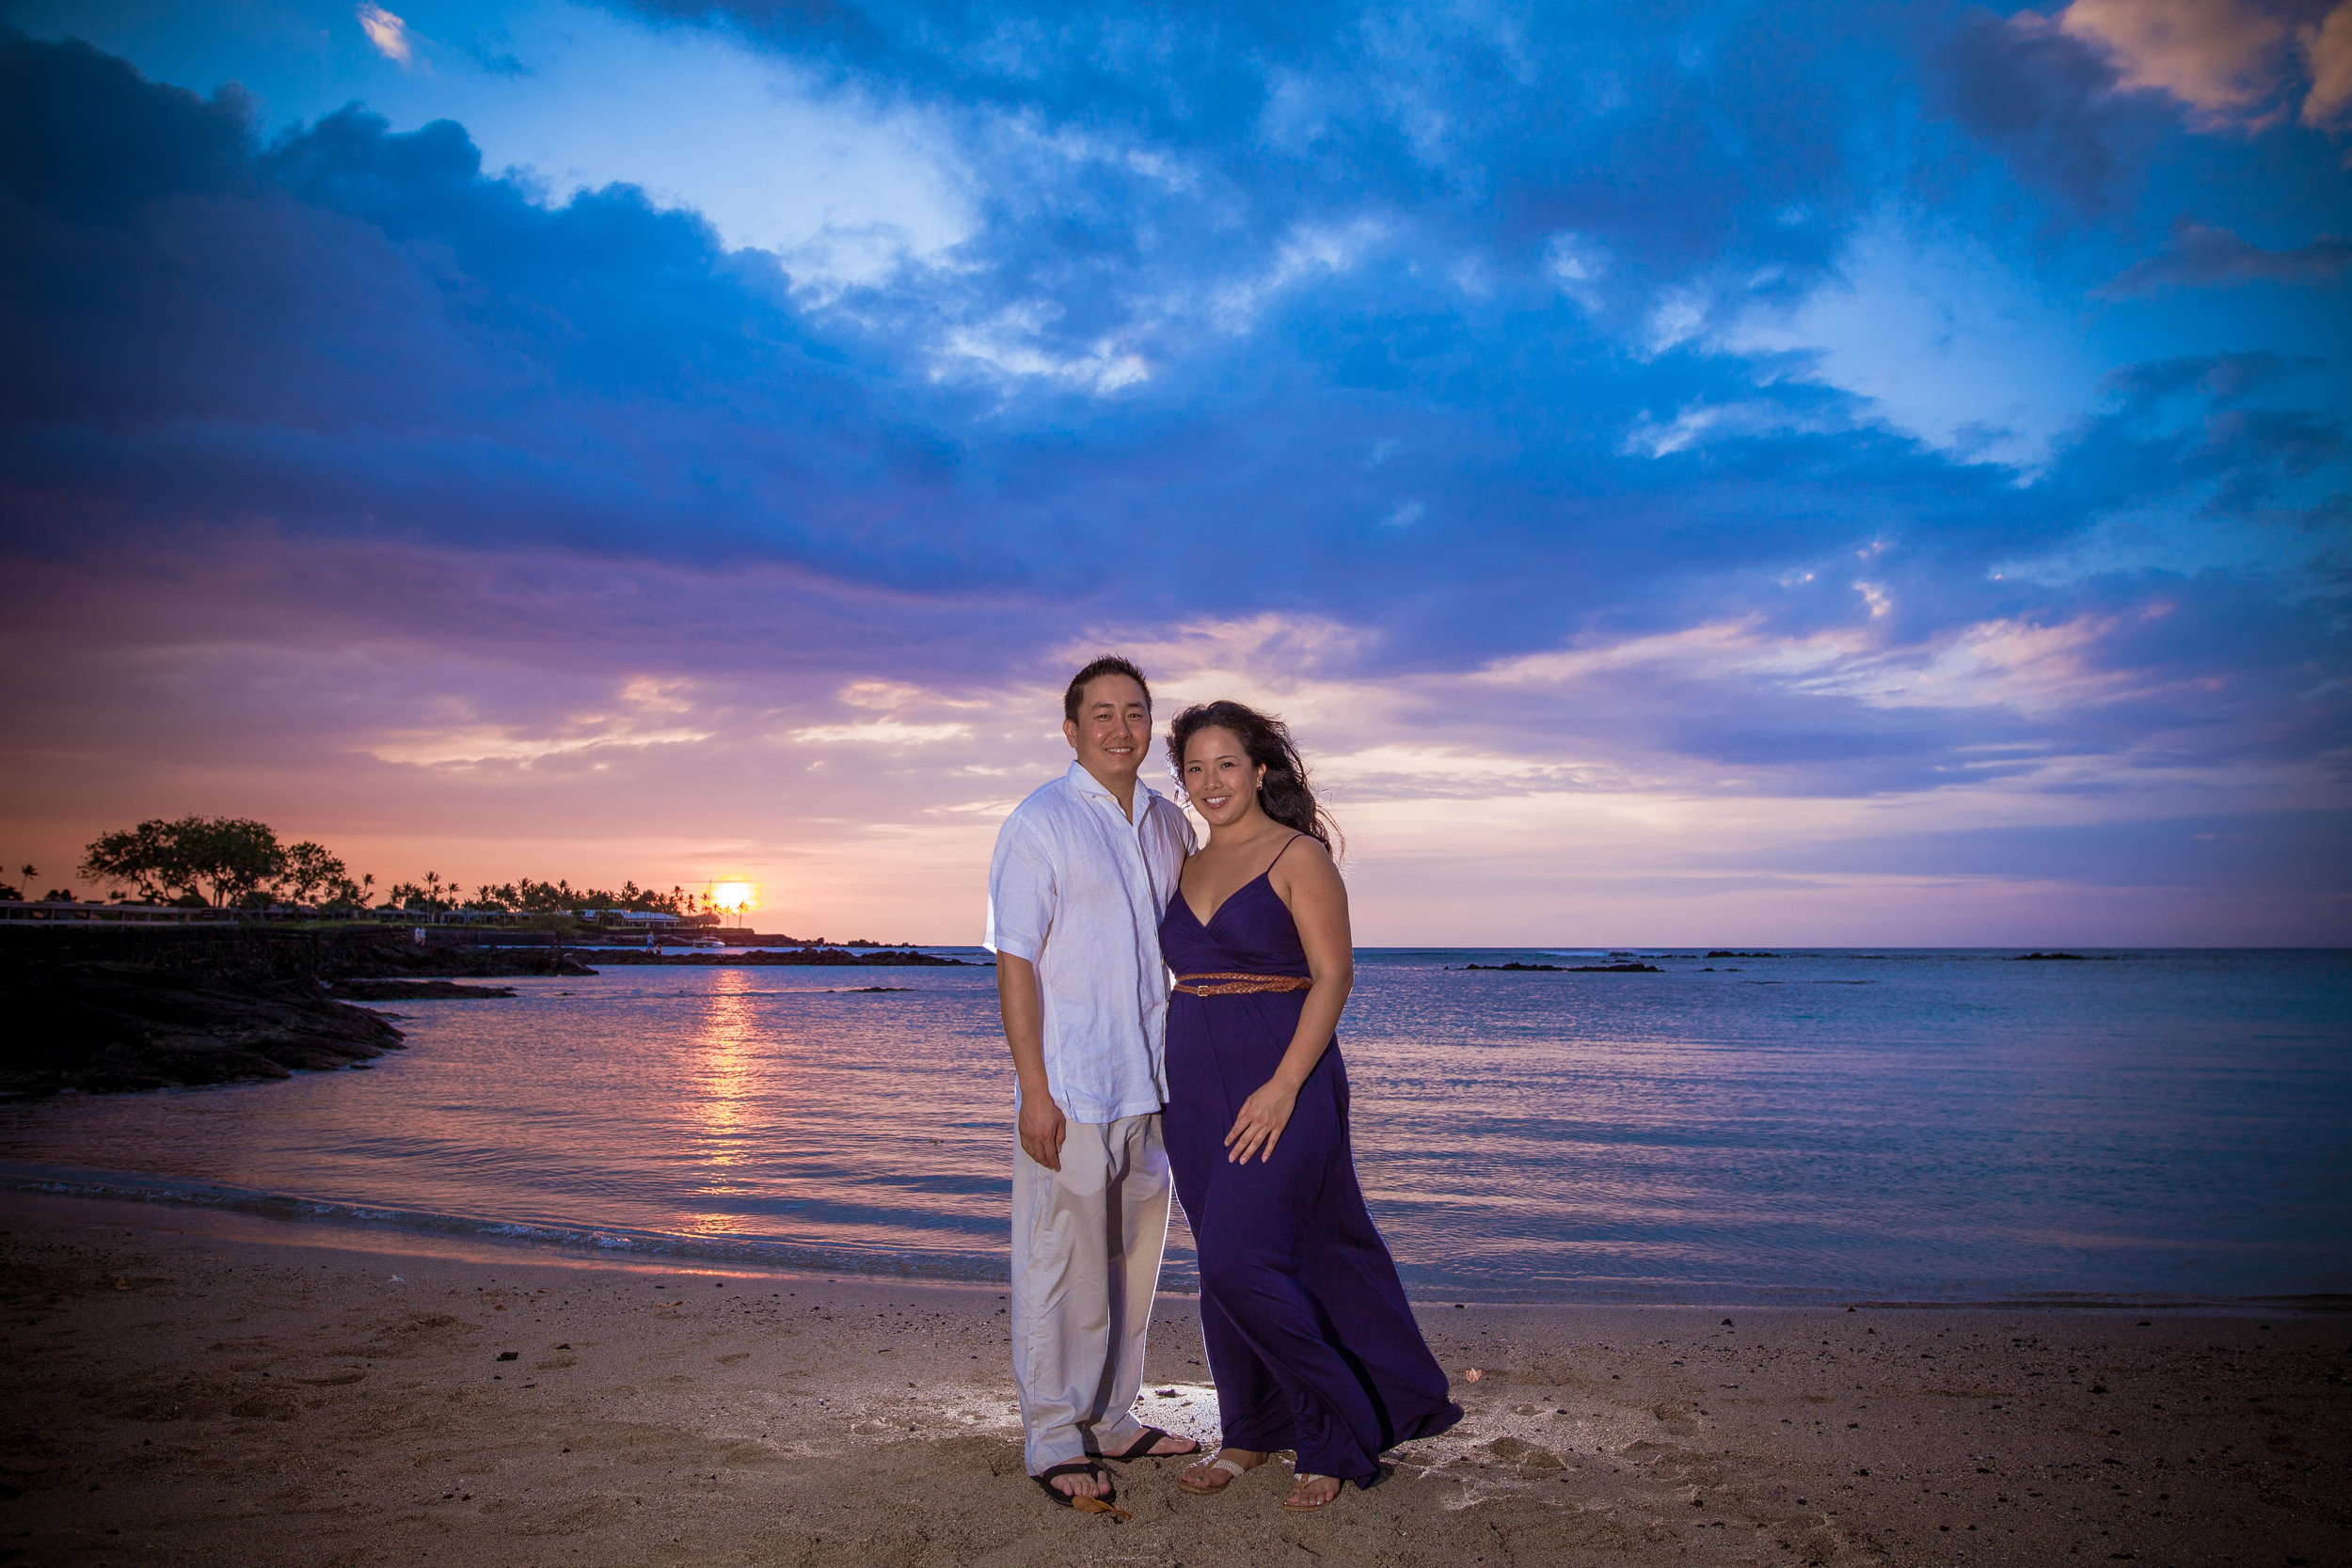 big island hawaii mauna lani beach family © kelilina photography 20161121231657.jpg